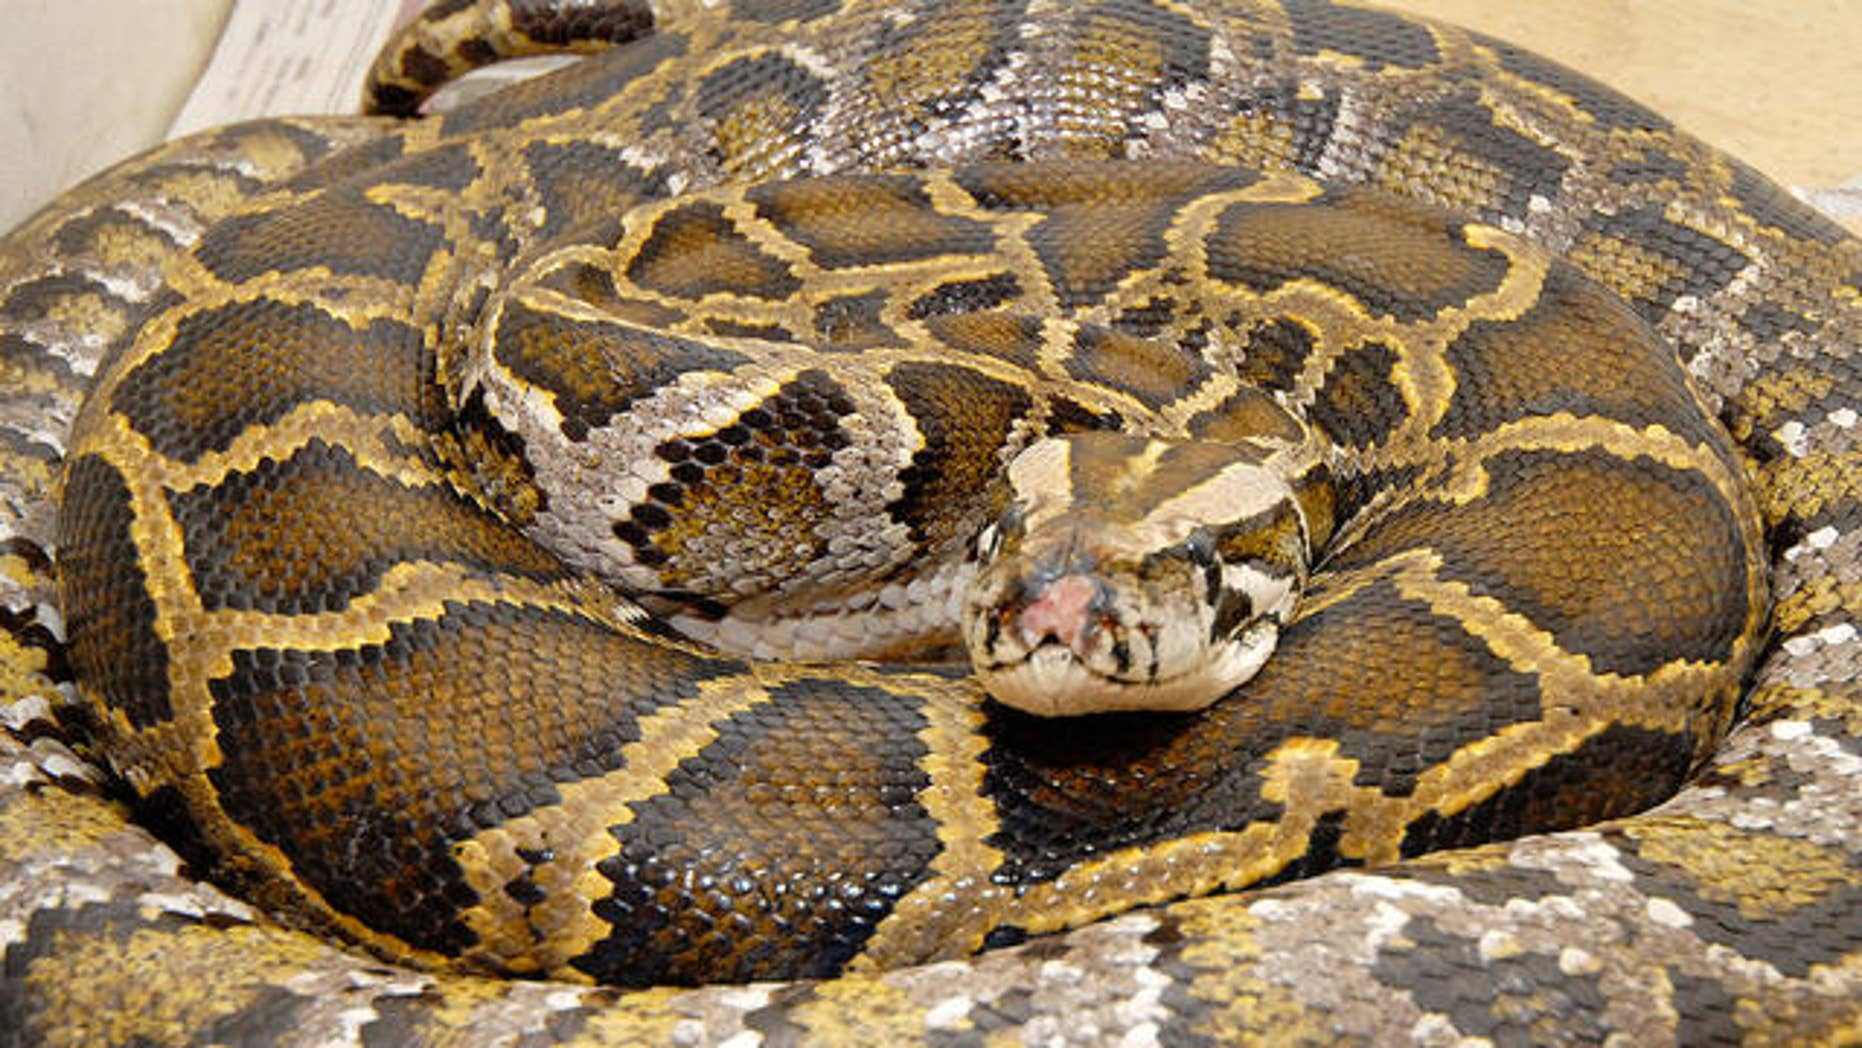 FILE photo of 12-foot Burmese python.